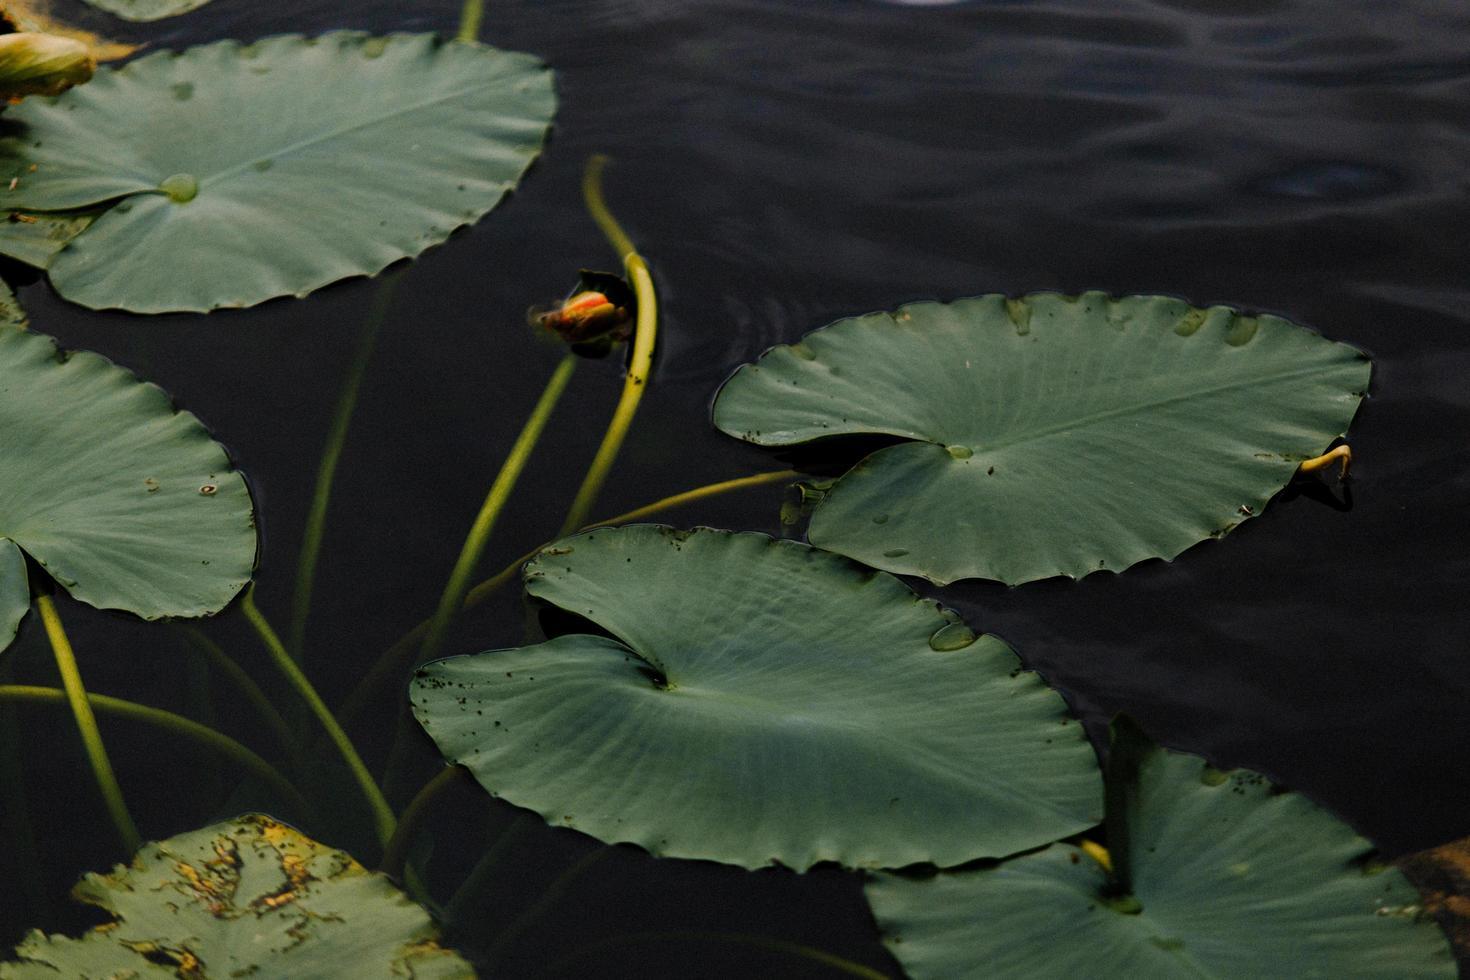 närbild av gröna liljekapslar foto